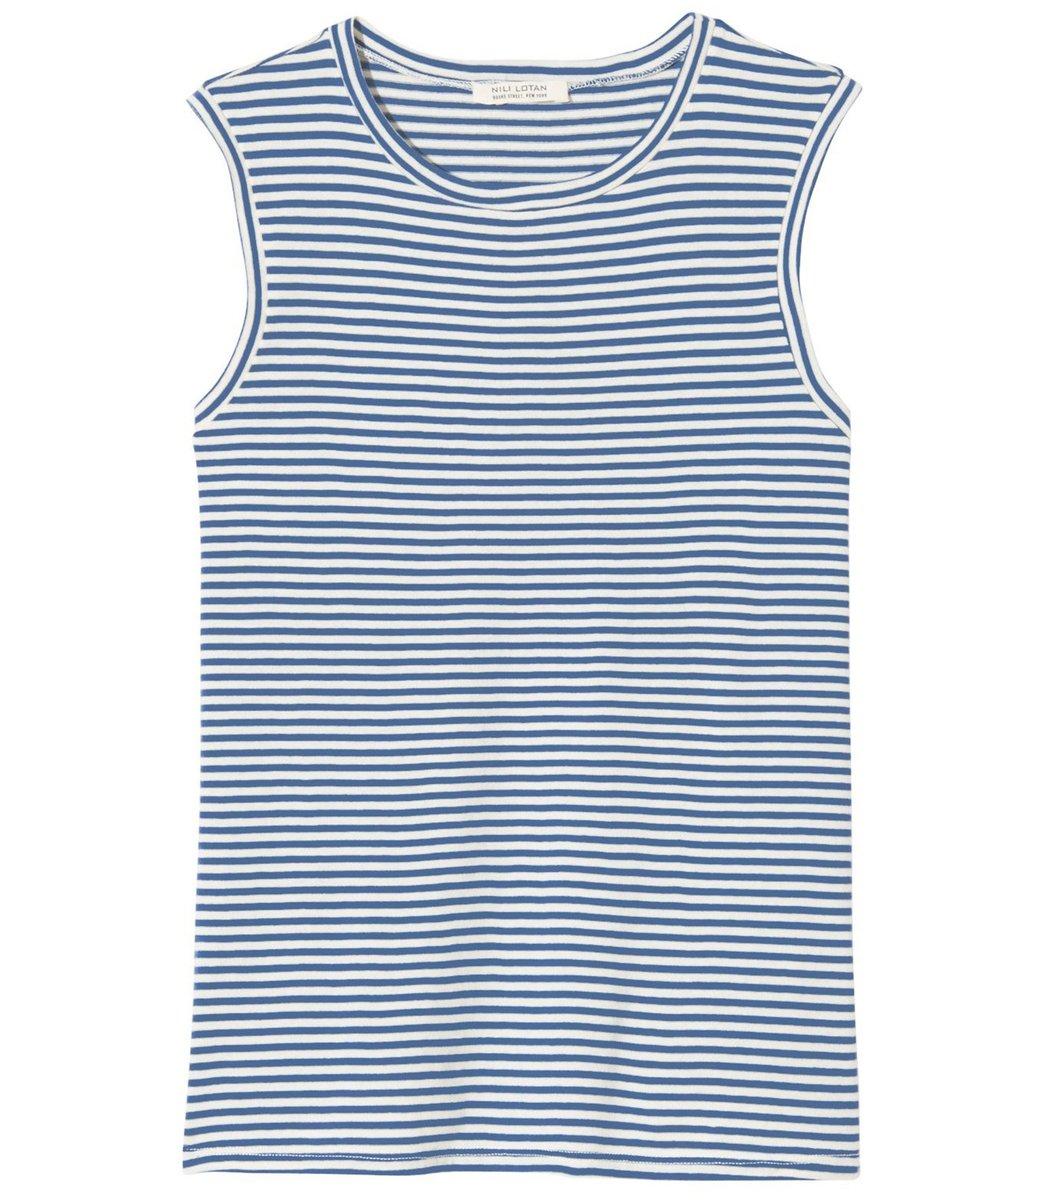 Nili Lotan Muscle Tee in Sail Blue/White Stripe